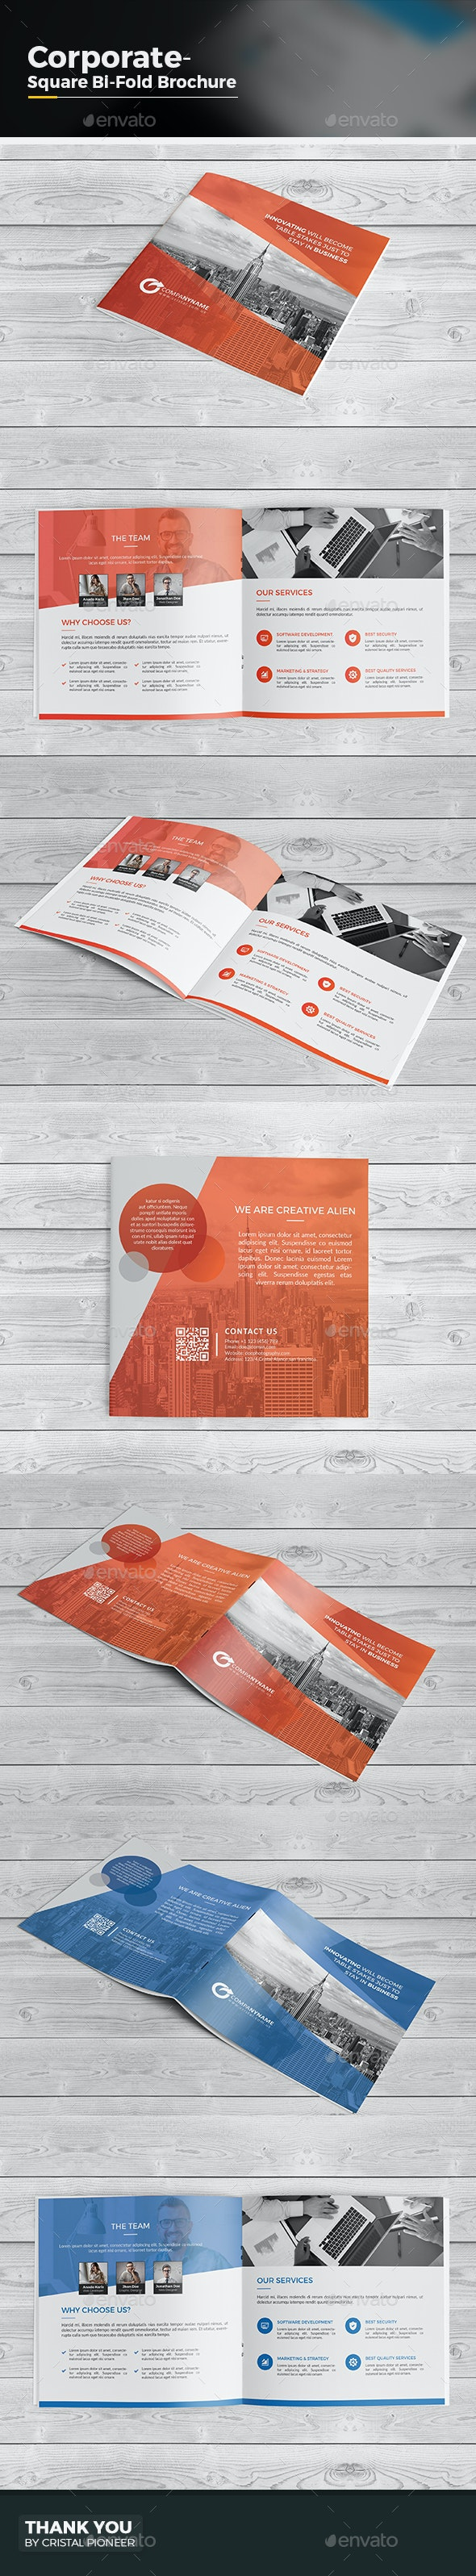 Square Bi Fold Brochure - Corporate Brochures